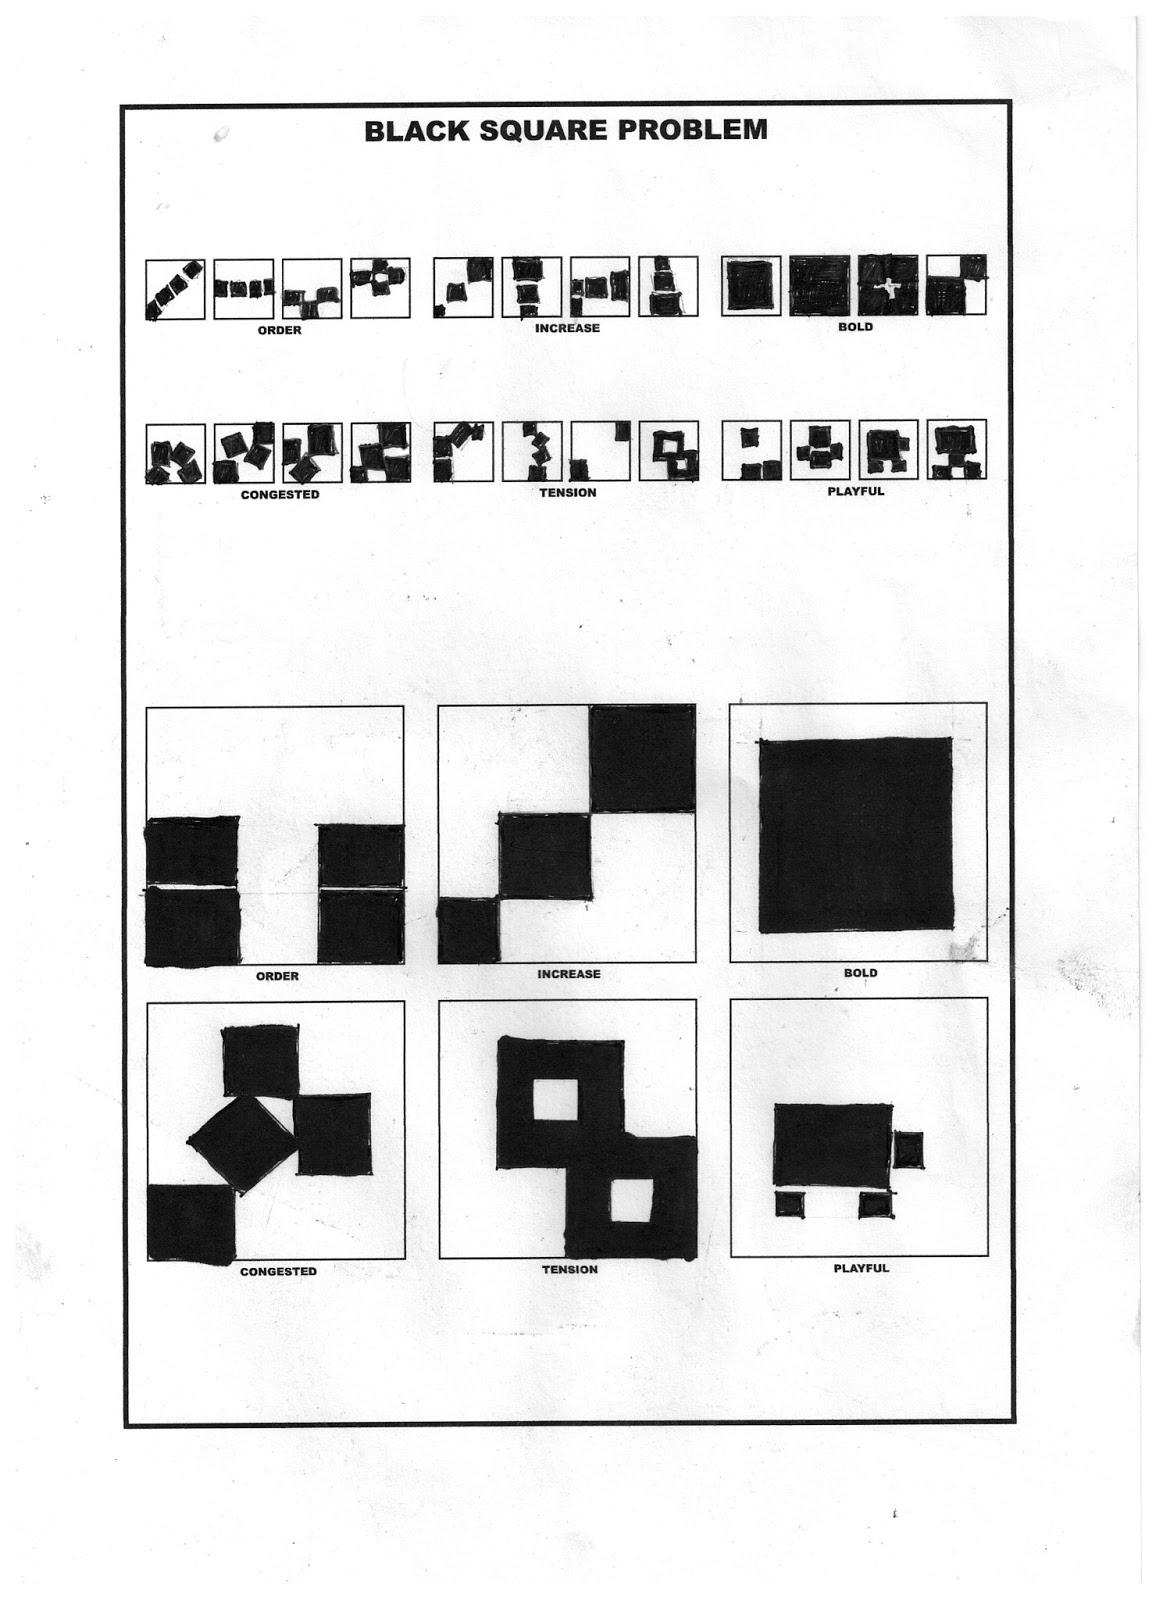 starting graphic design course: black square problem